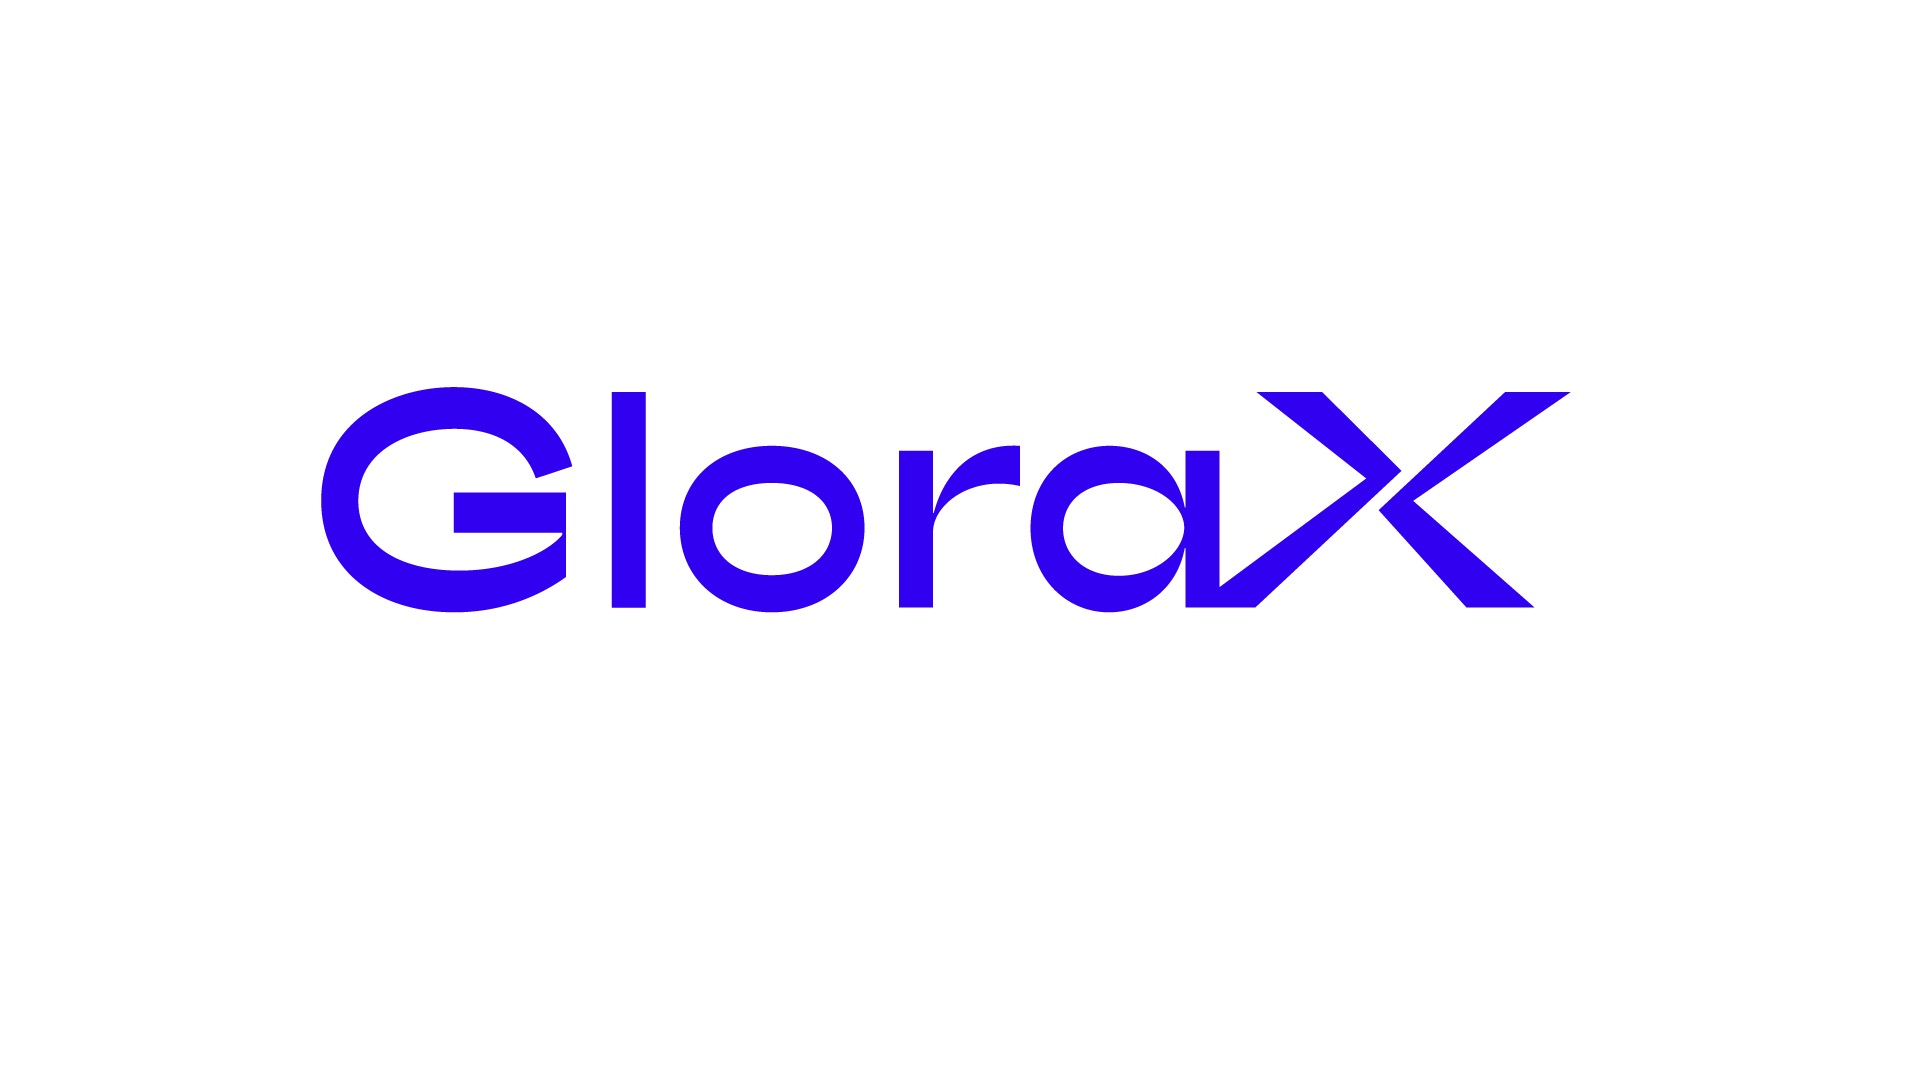 GloraX